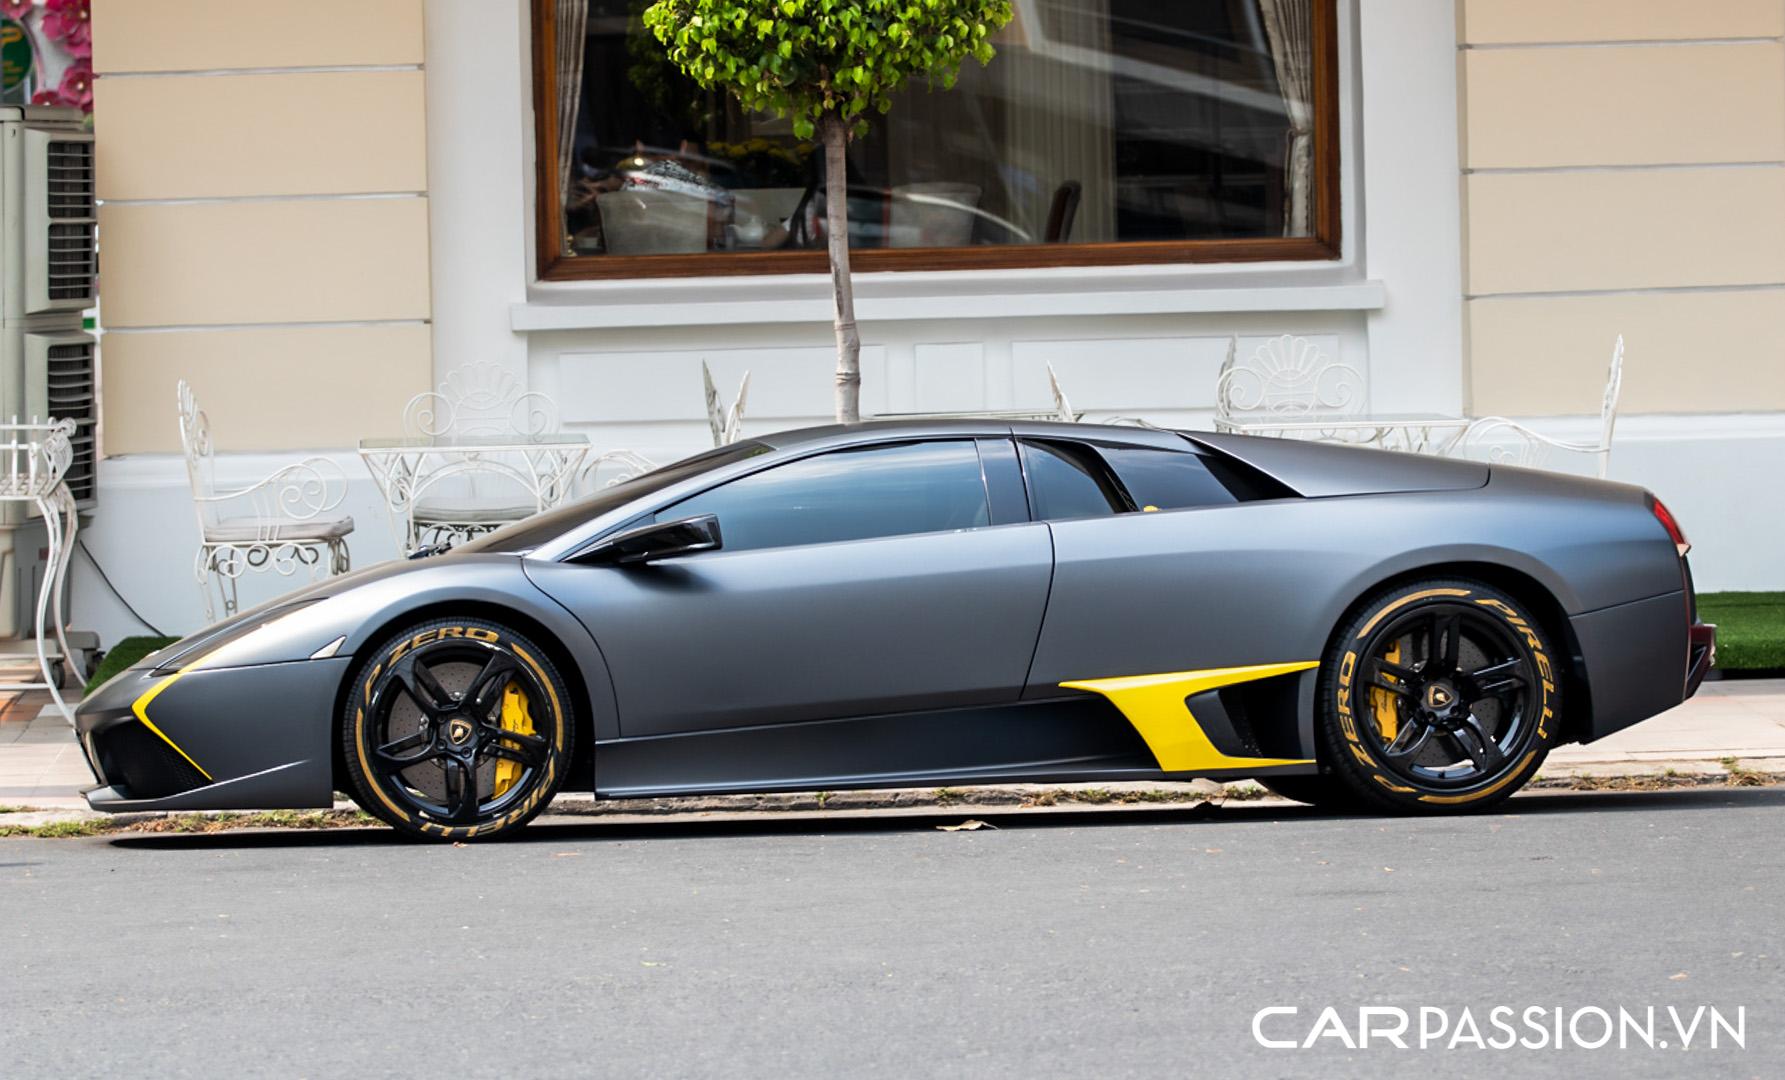 Lamborghini Murcielago đen mờ (21).JPG